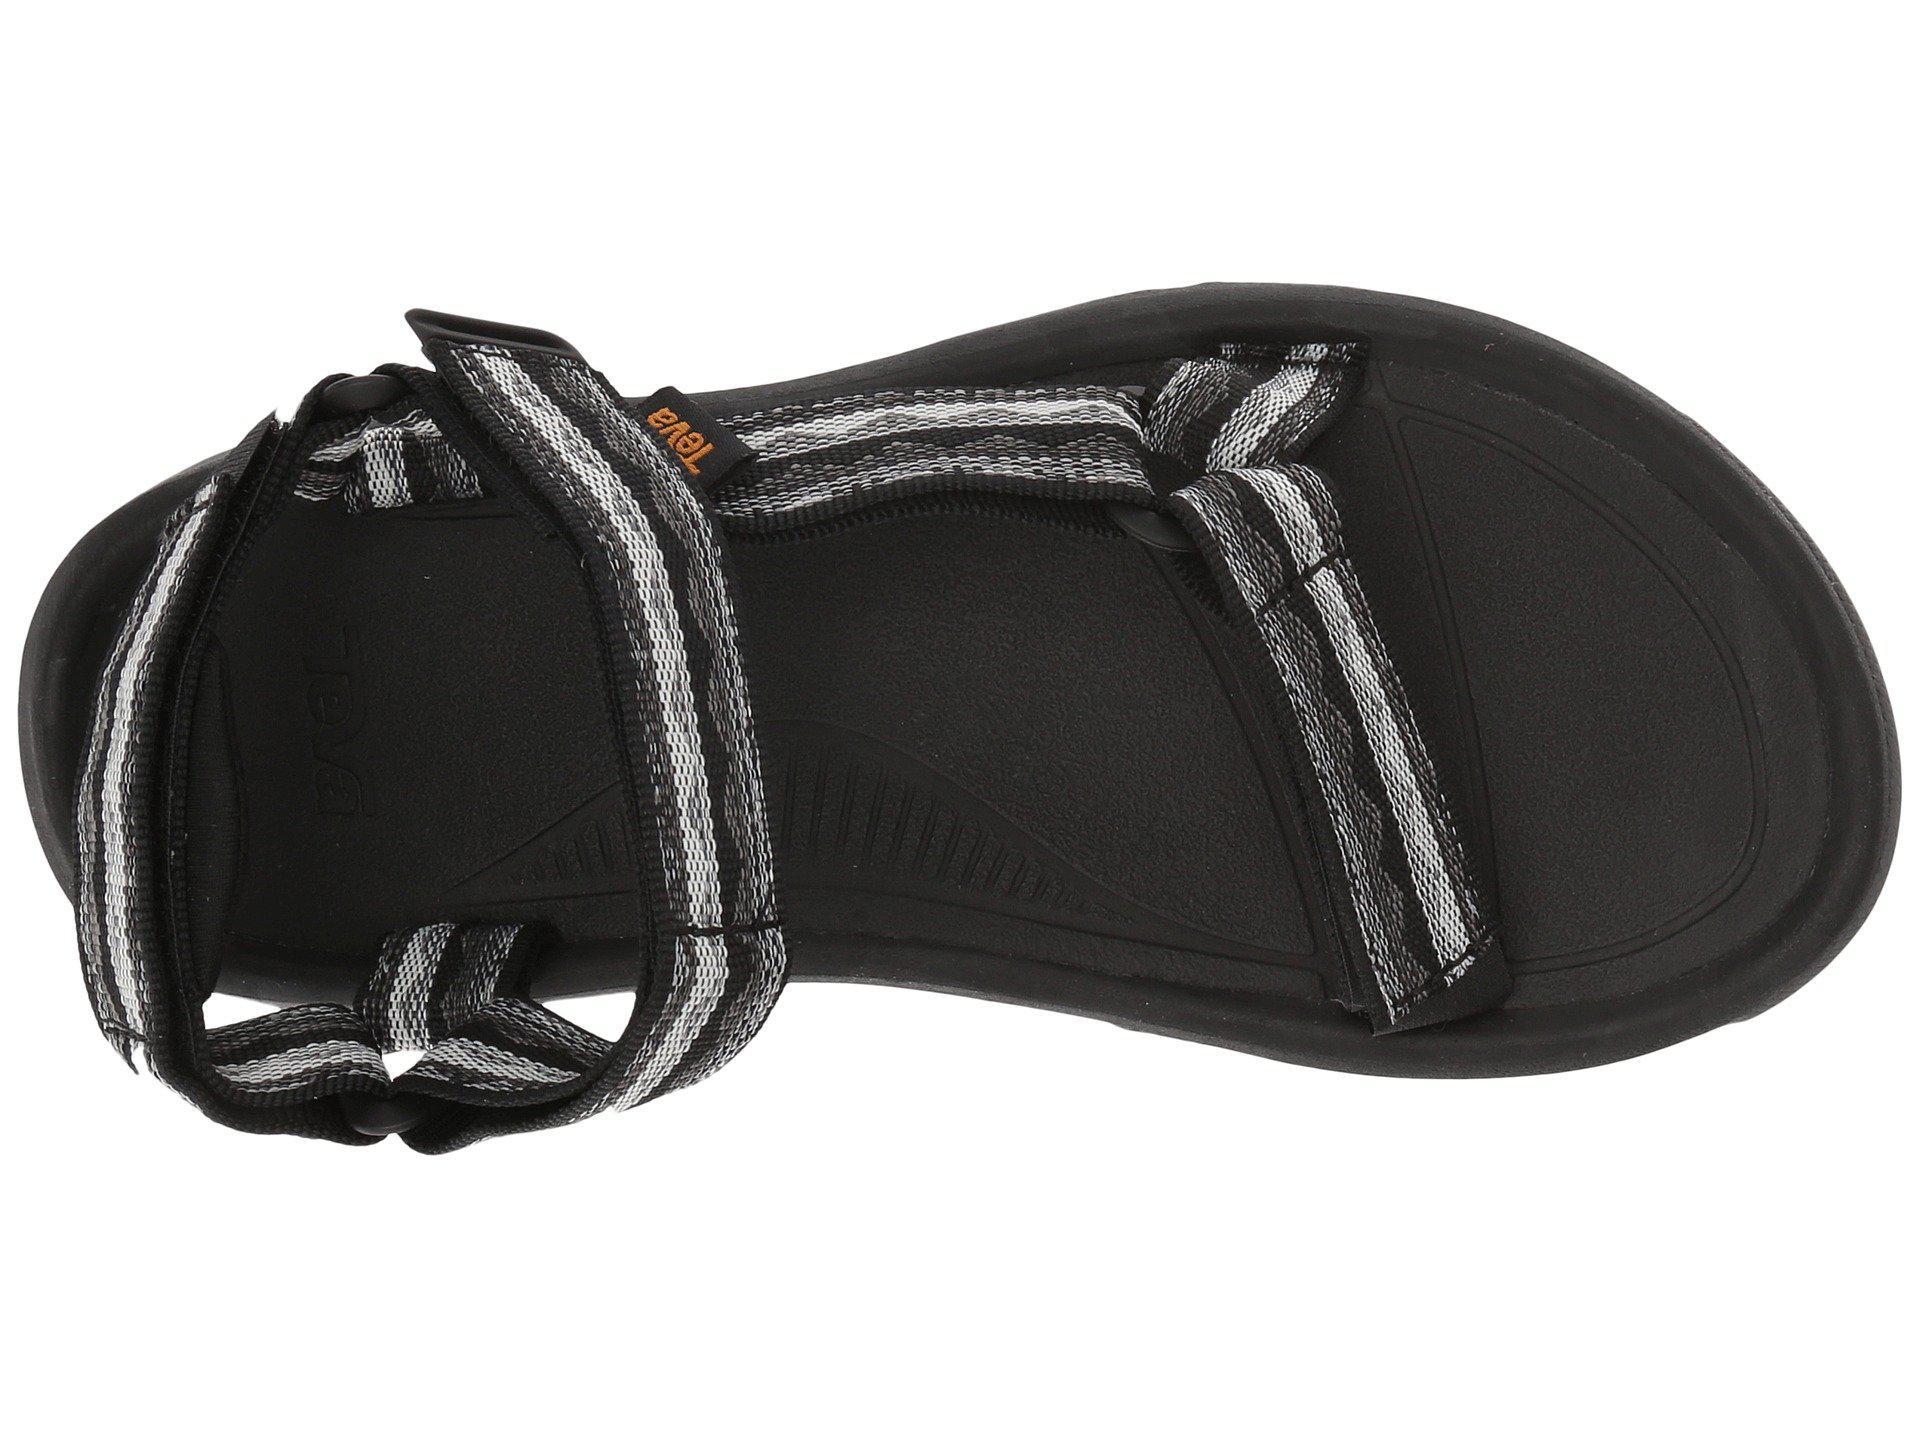 77807169f Teva - Black Hurricane Xlt2 (lago Blue) Women s Shoes - Lyst. View  fullscreen